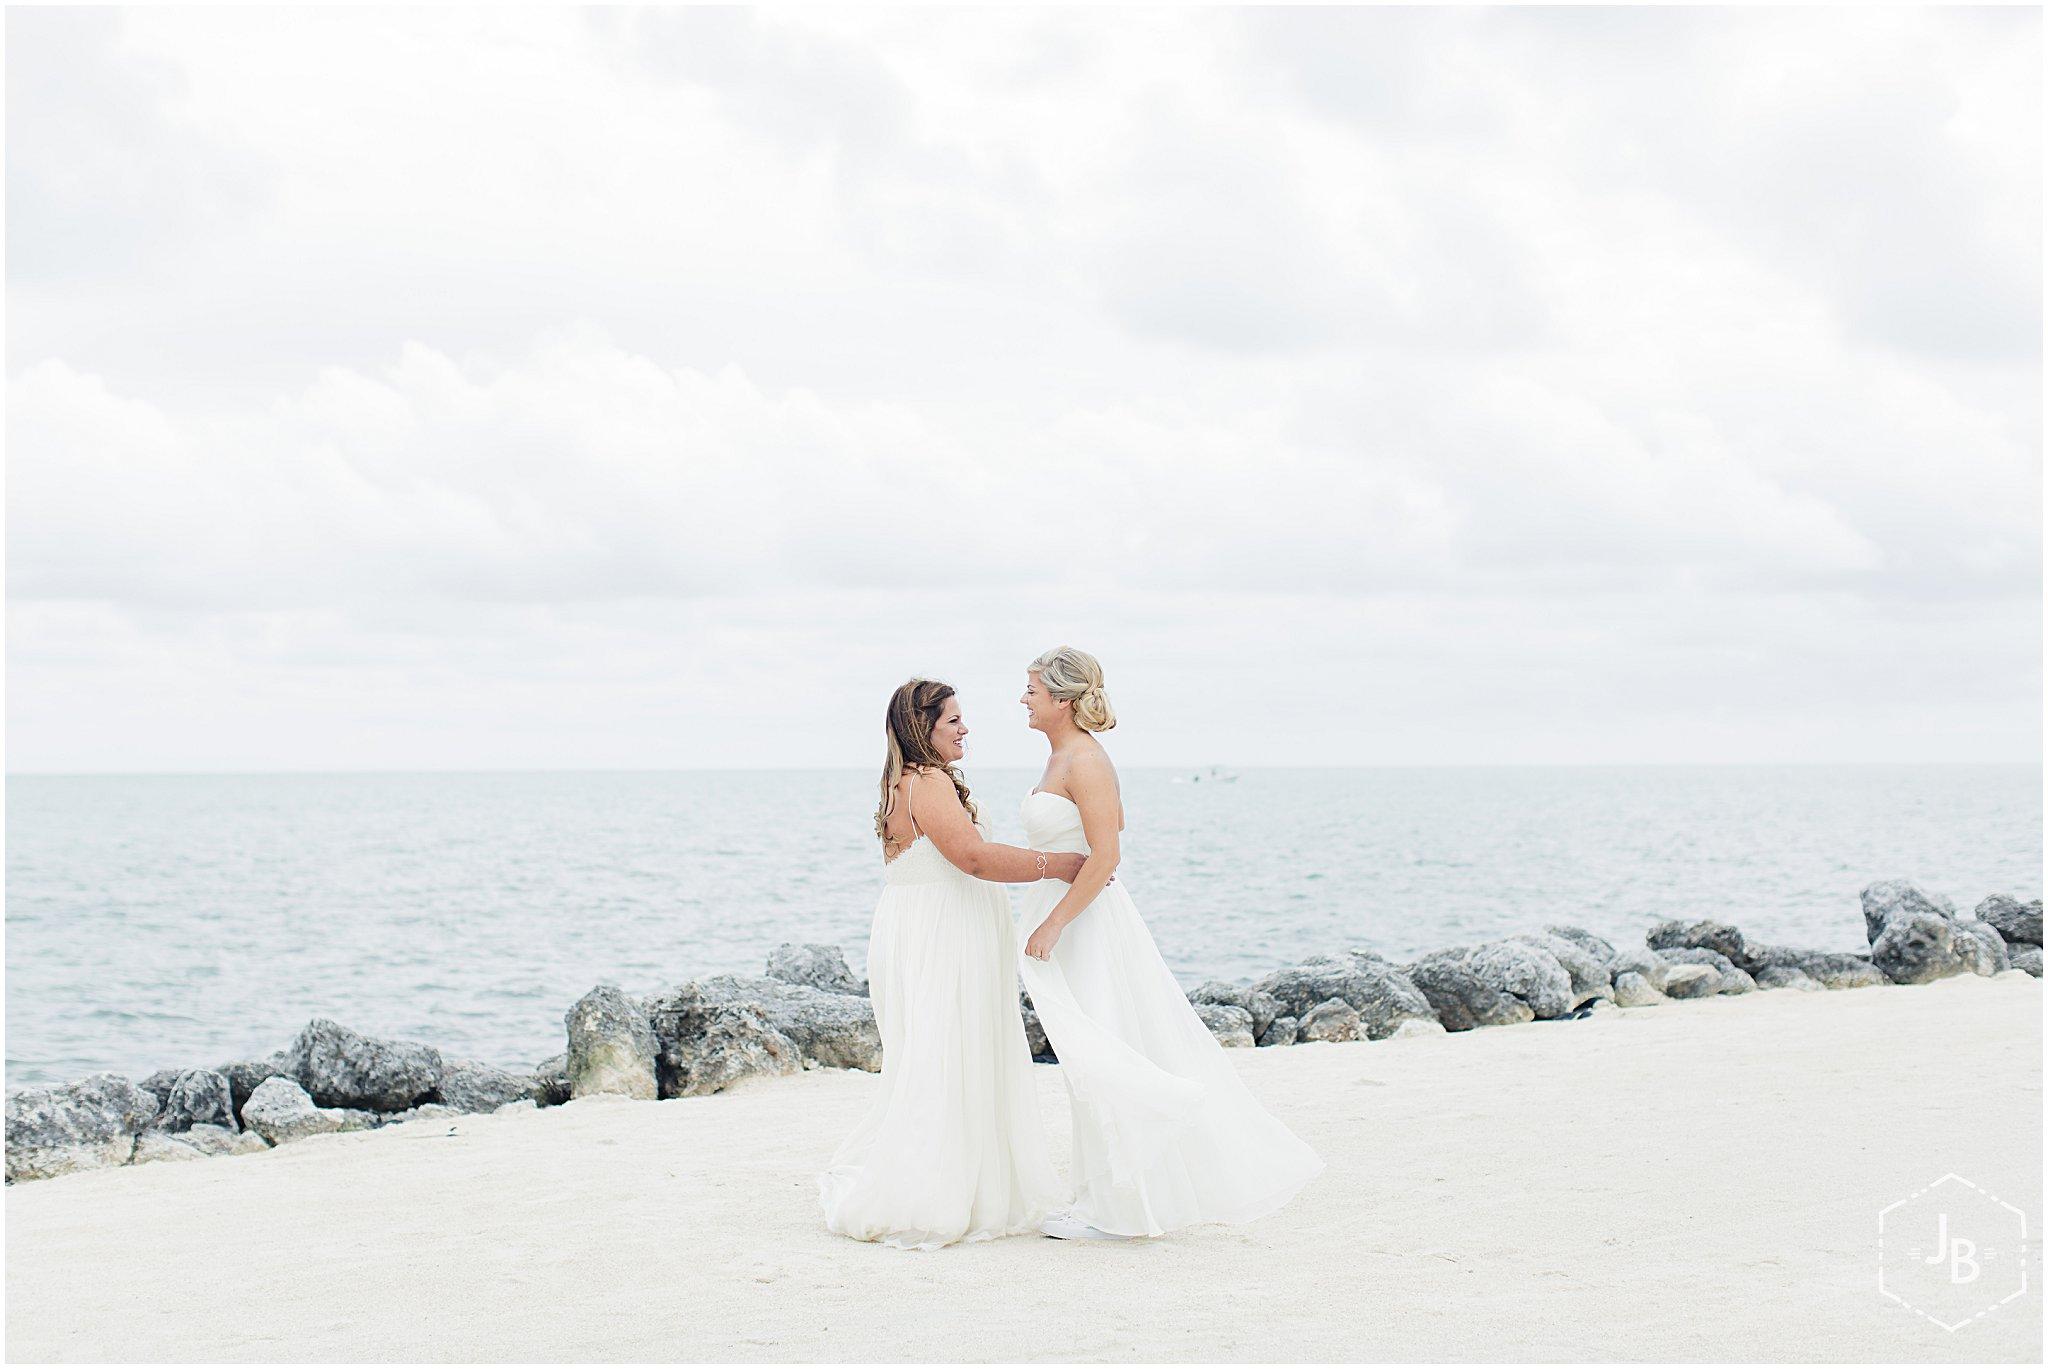 WeddingandEngagementFloridaPhotographer_1438.jpg